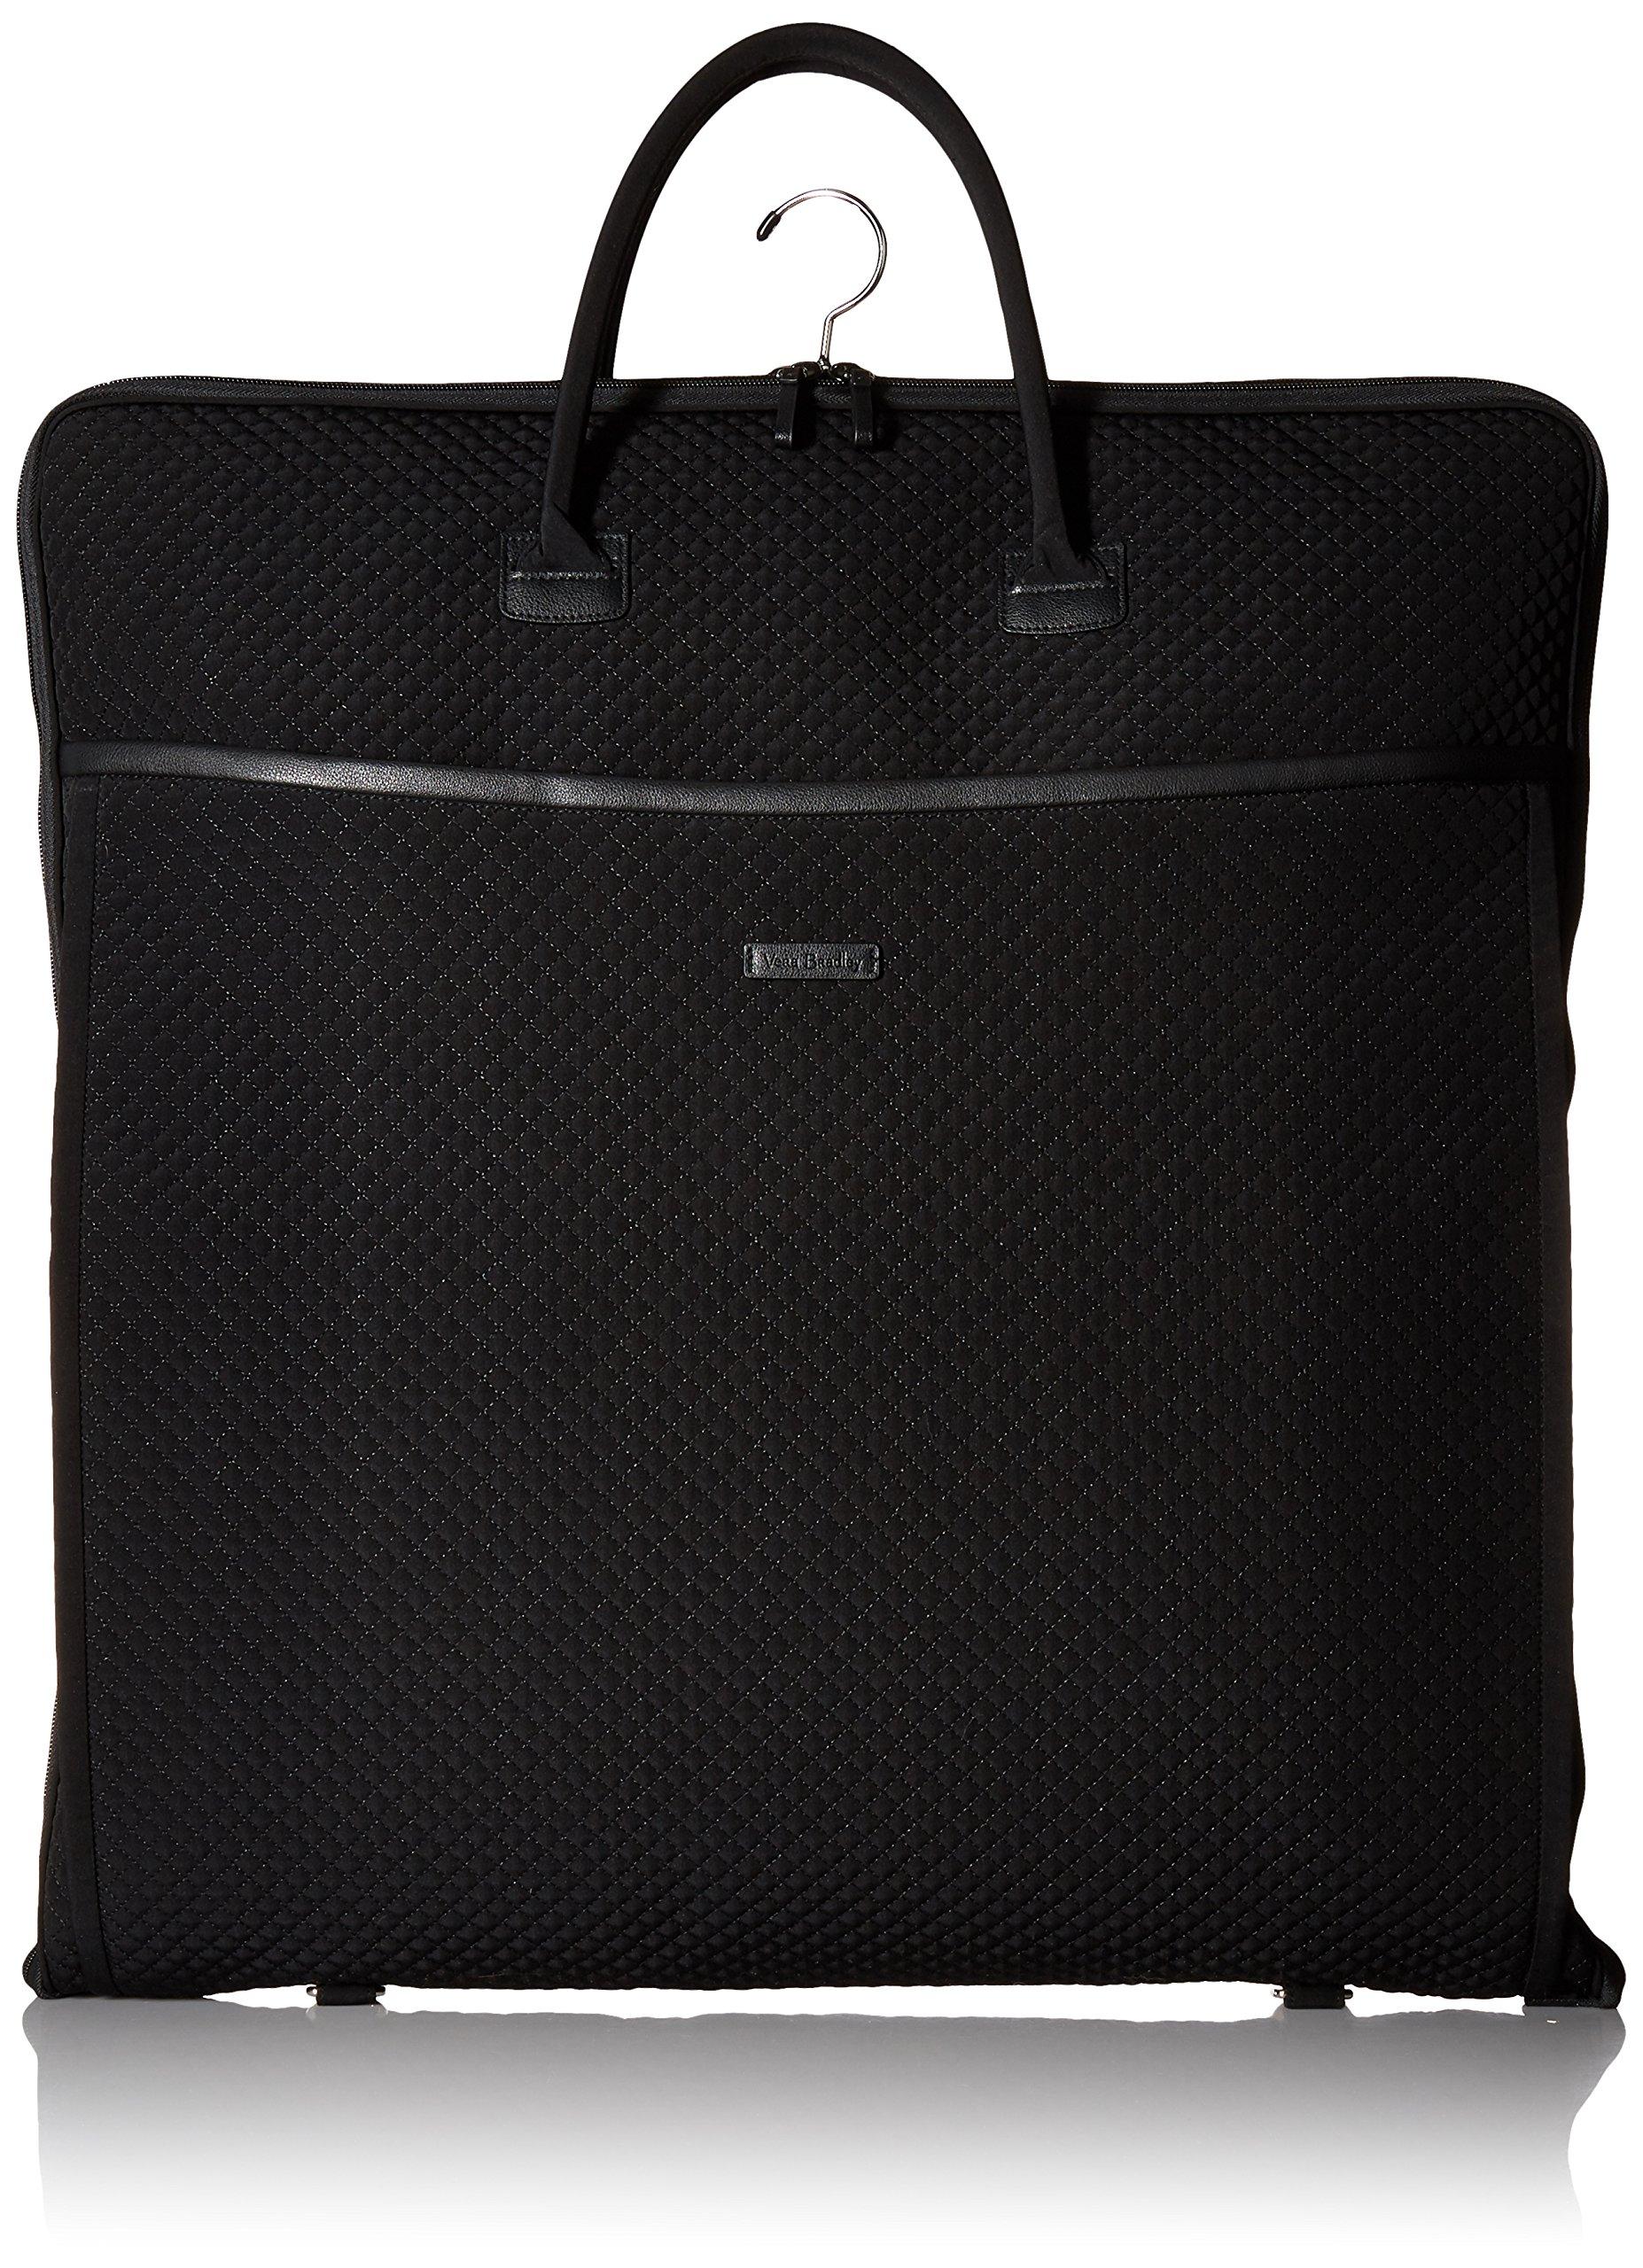 Vera Bradley Iconic Garment Bag, Microfiber